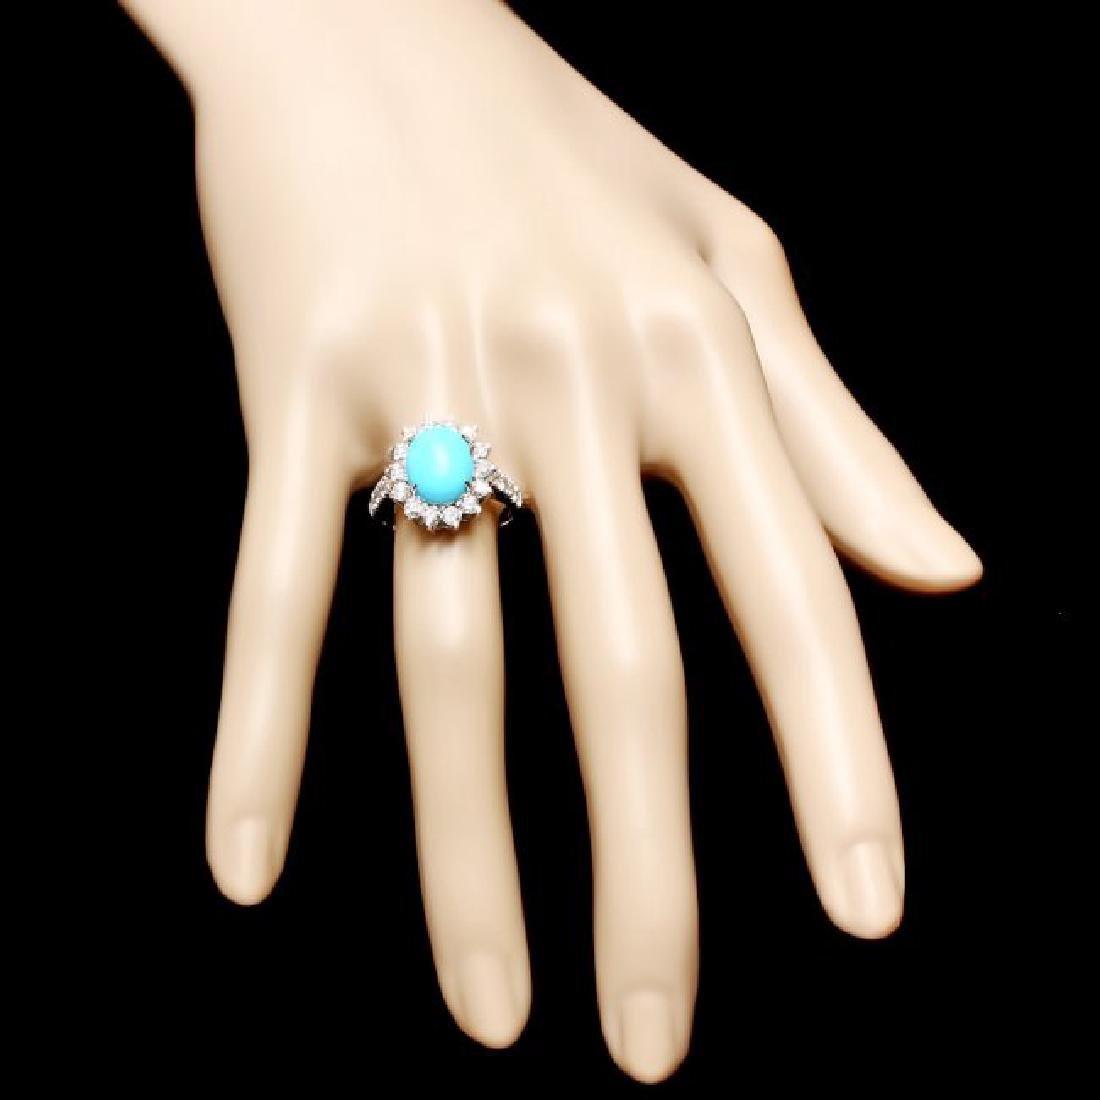 14k Gold 2.50ct Turquoise 1.20ct Diamond Ring - 4